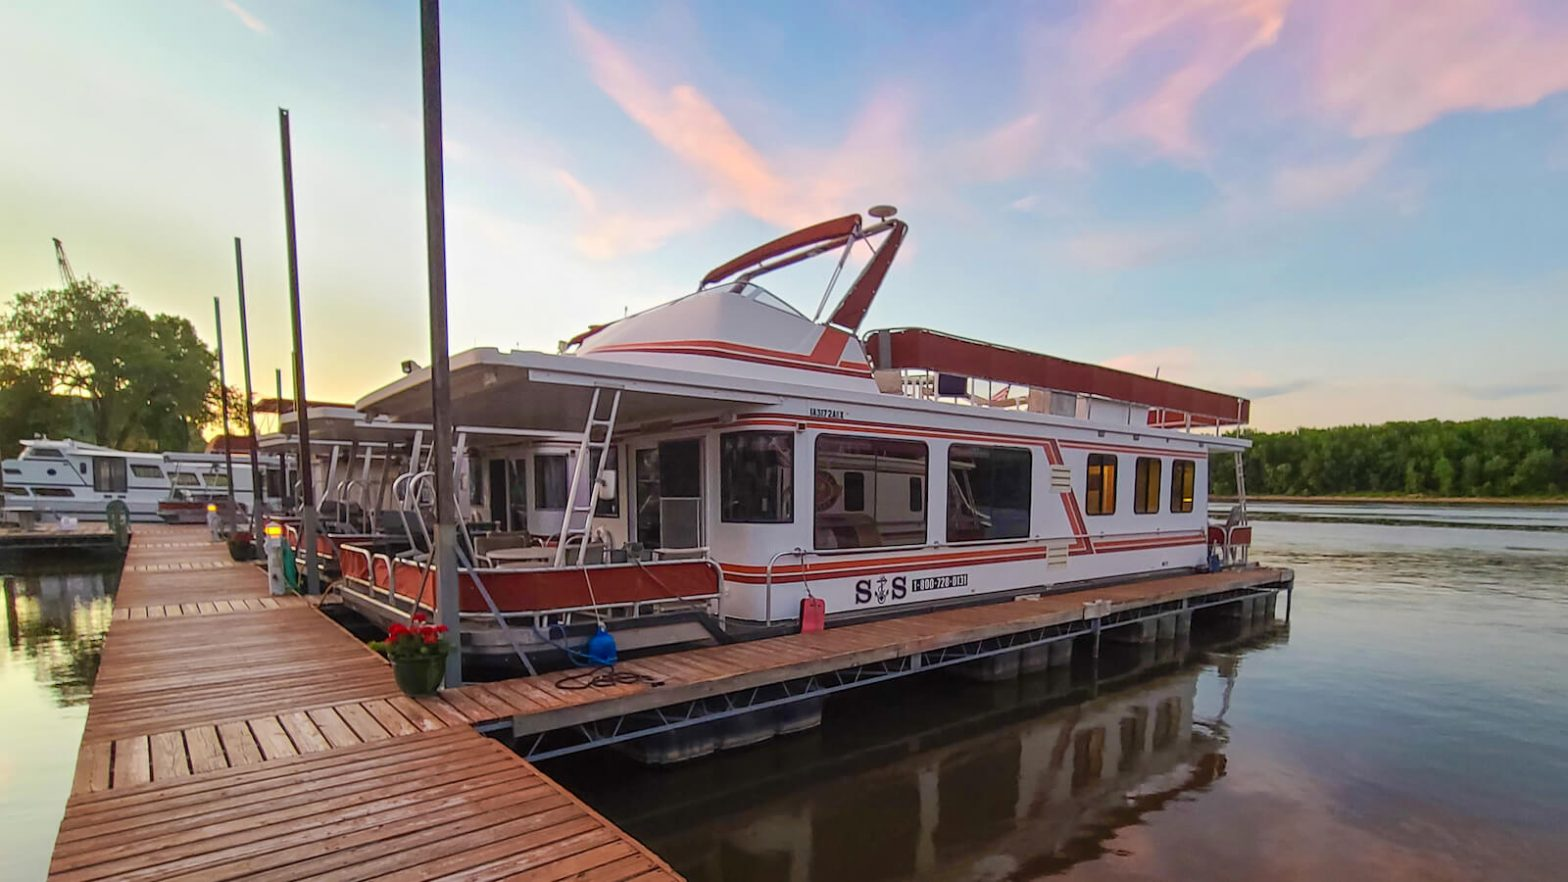 S&S Rentals Sunstar Houseboat docked at sunset